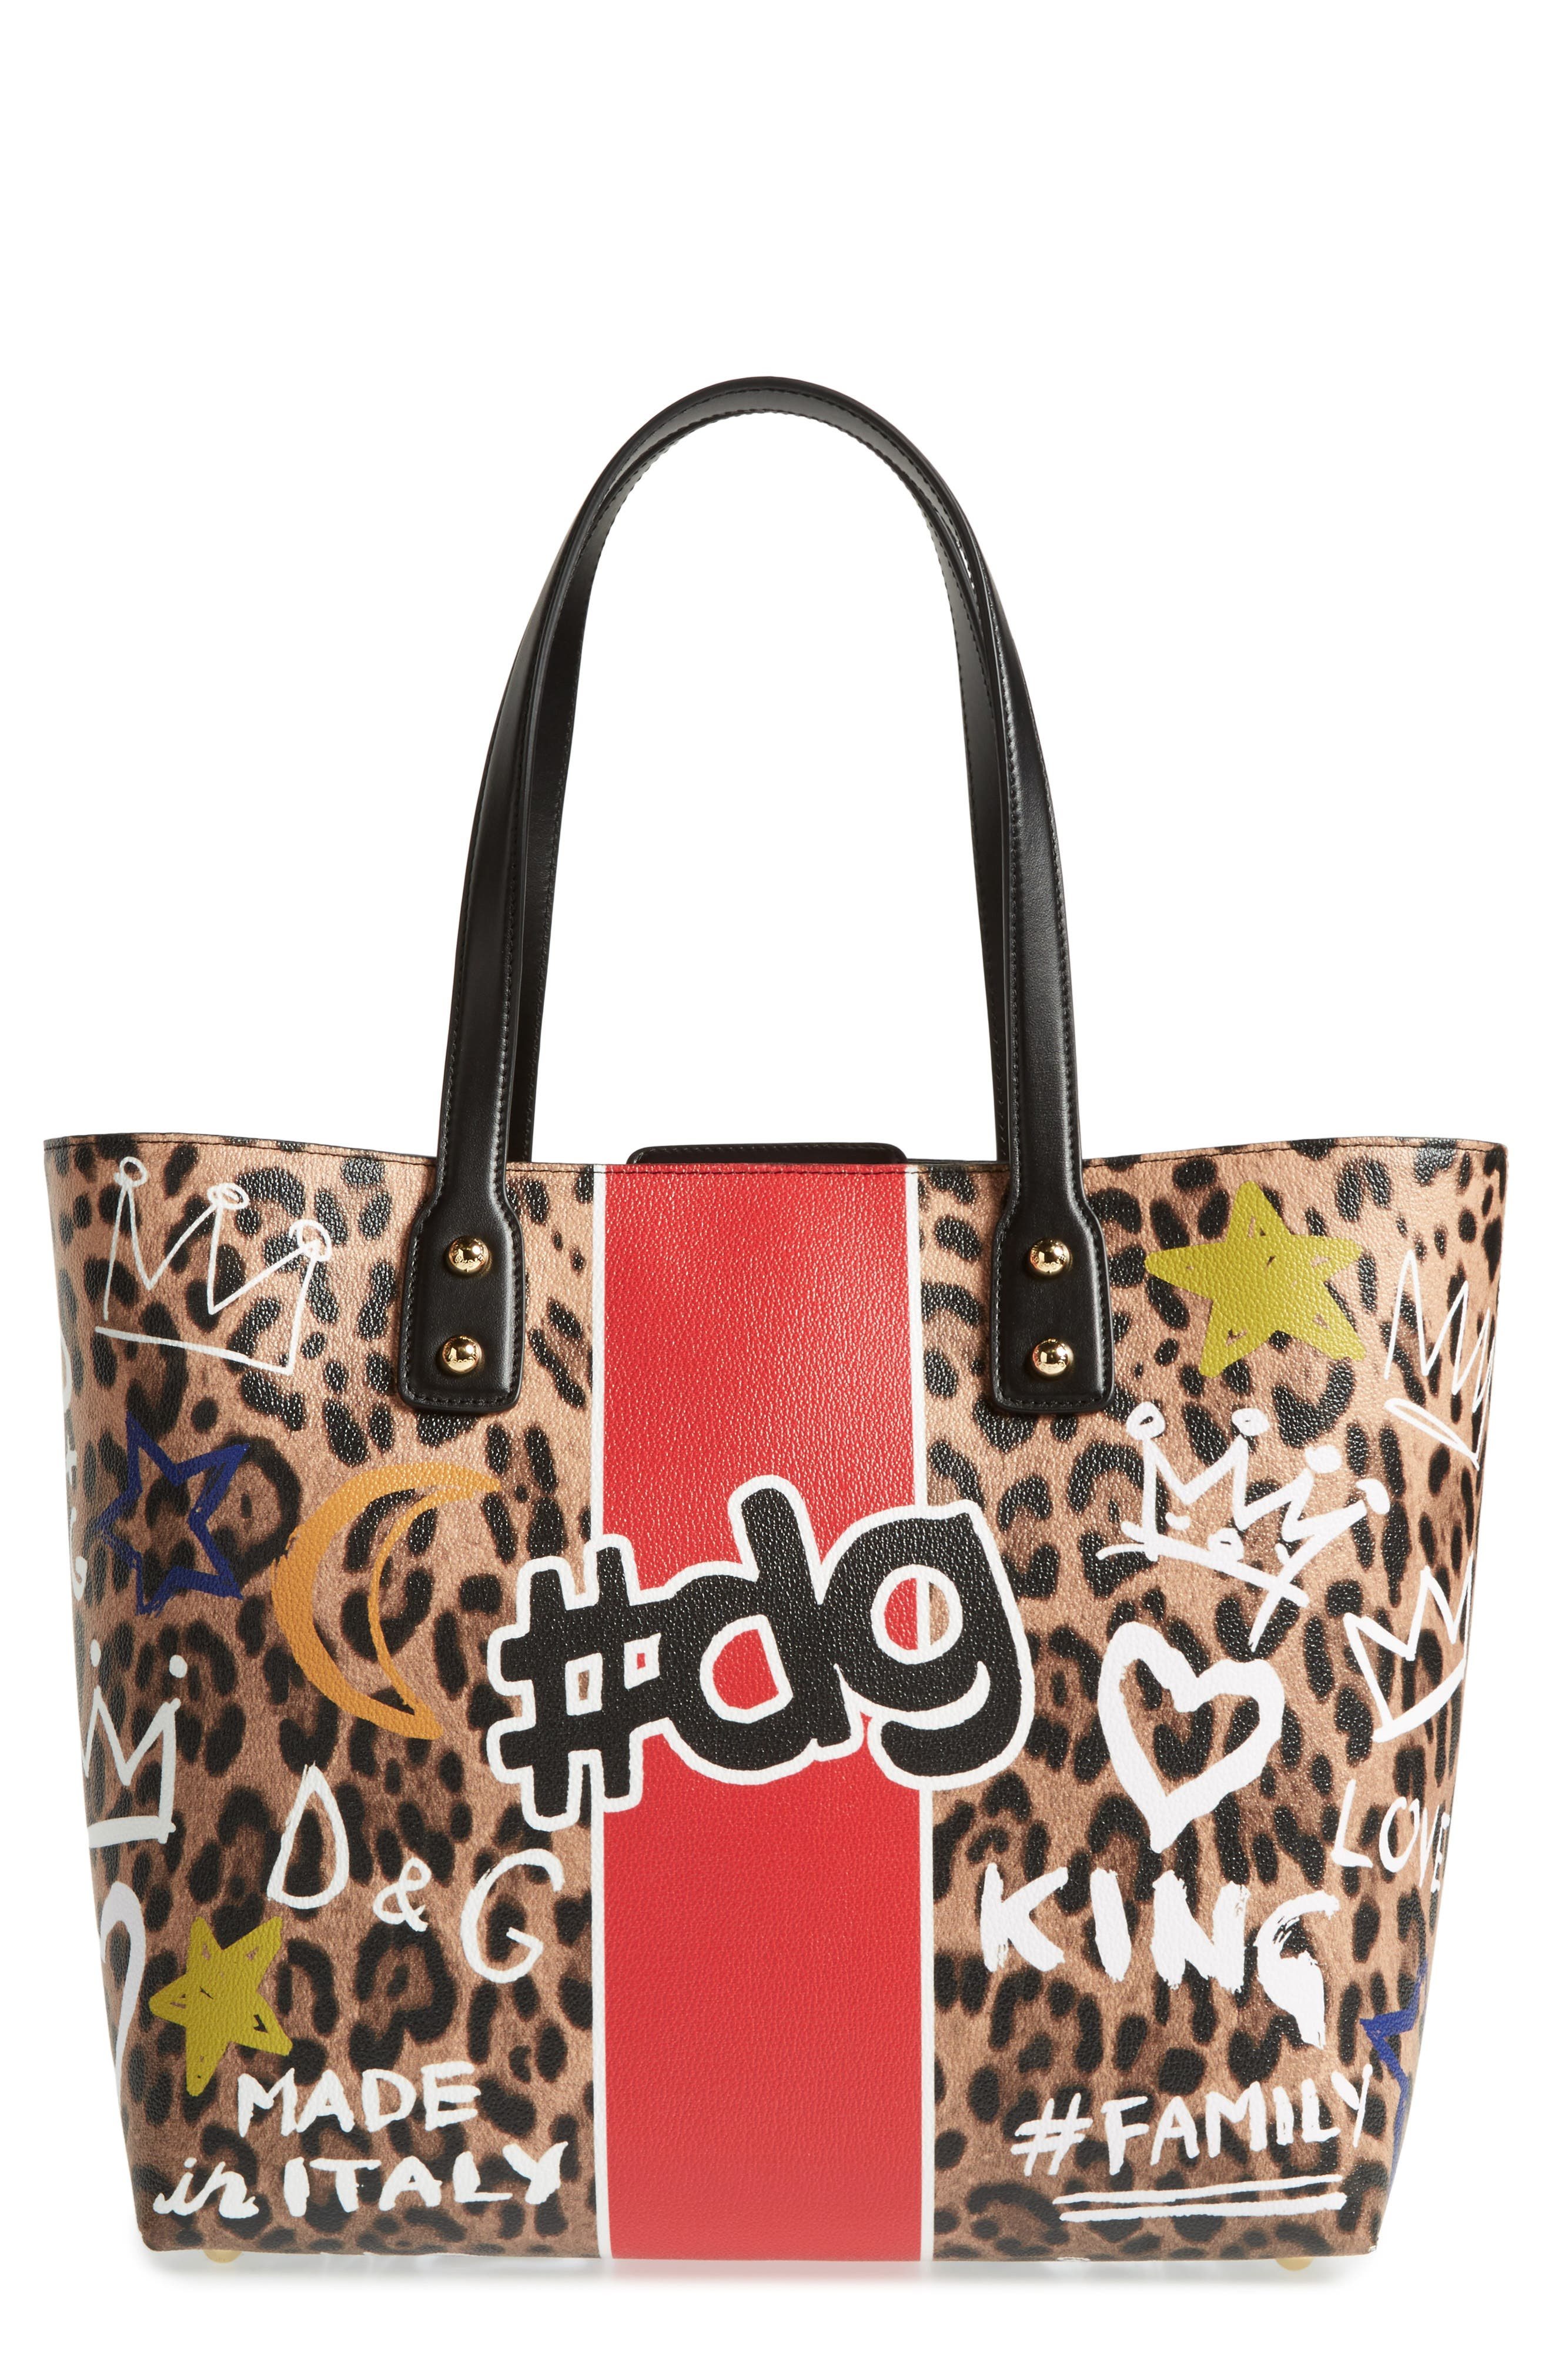 Dolce&Gabbana Large Hashtag Graffiti Leather Tote